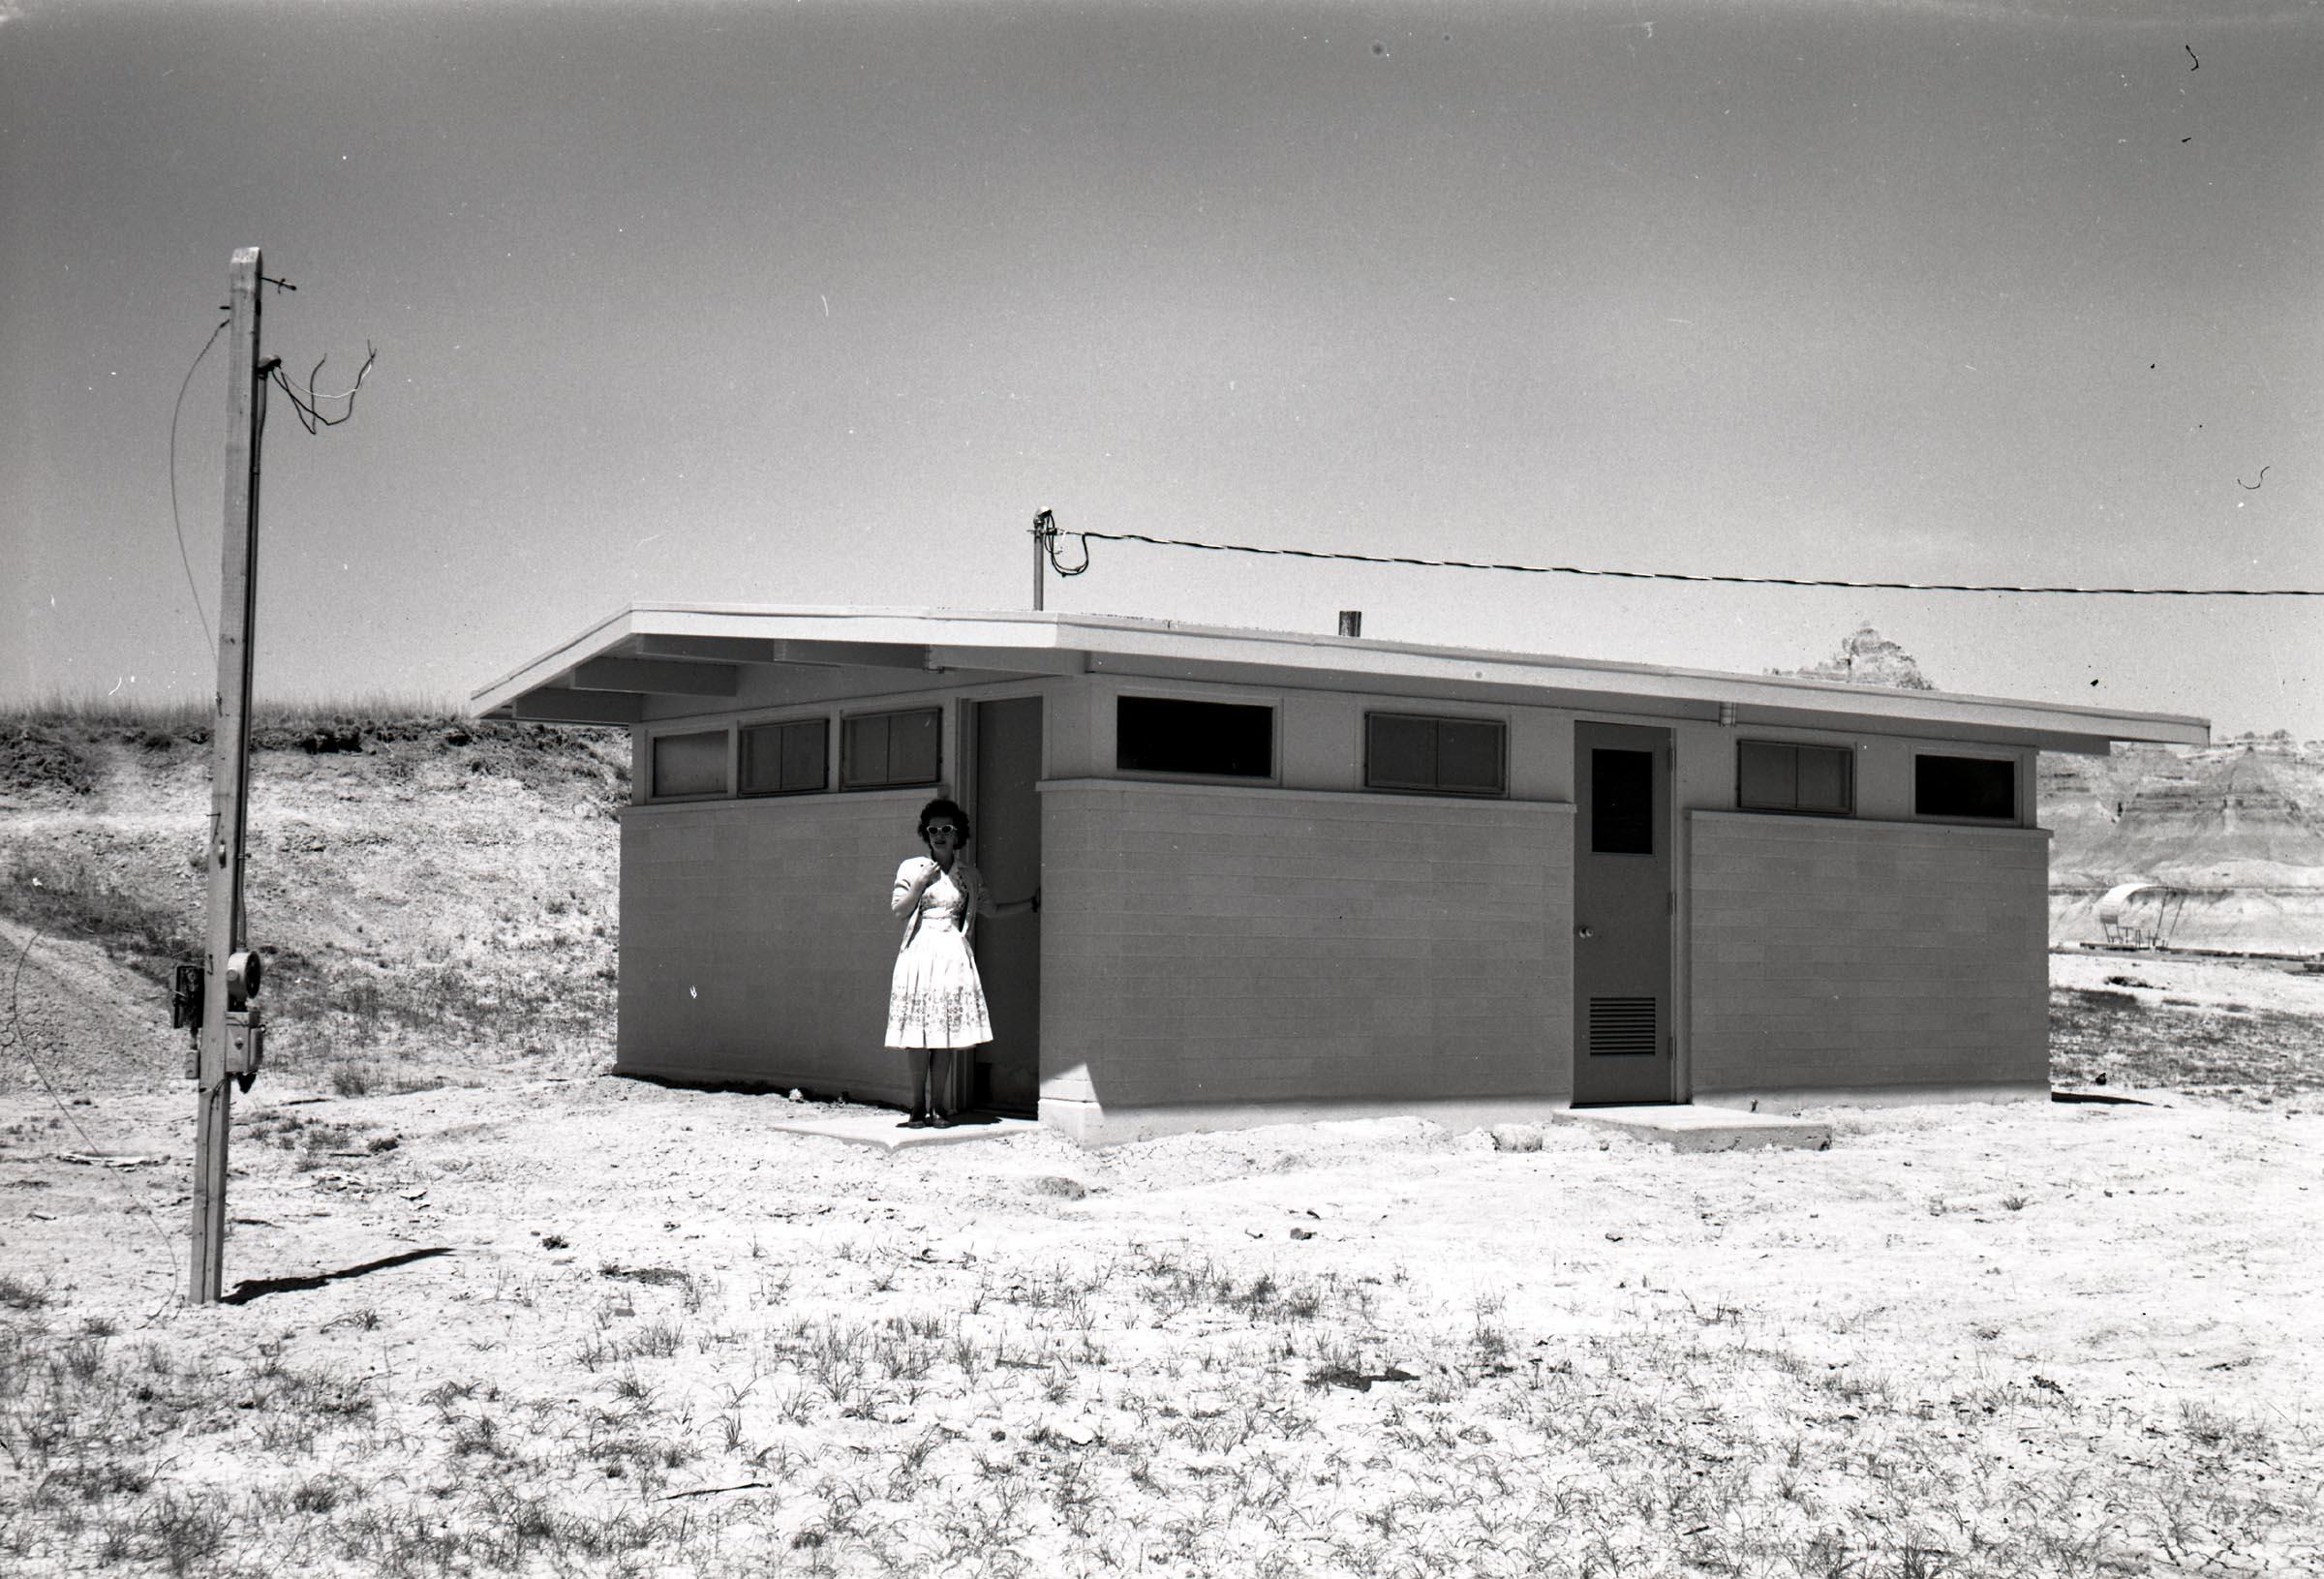 BADL2755-Comfort station; Cedar Pass Campground_1961-jpg634347512787314354.jpg